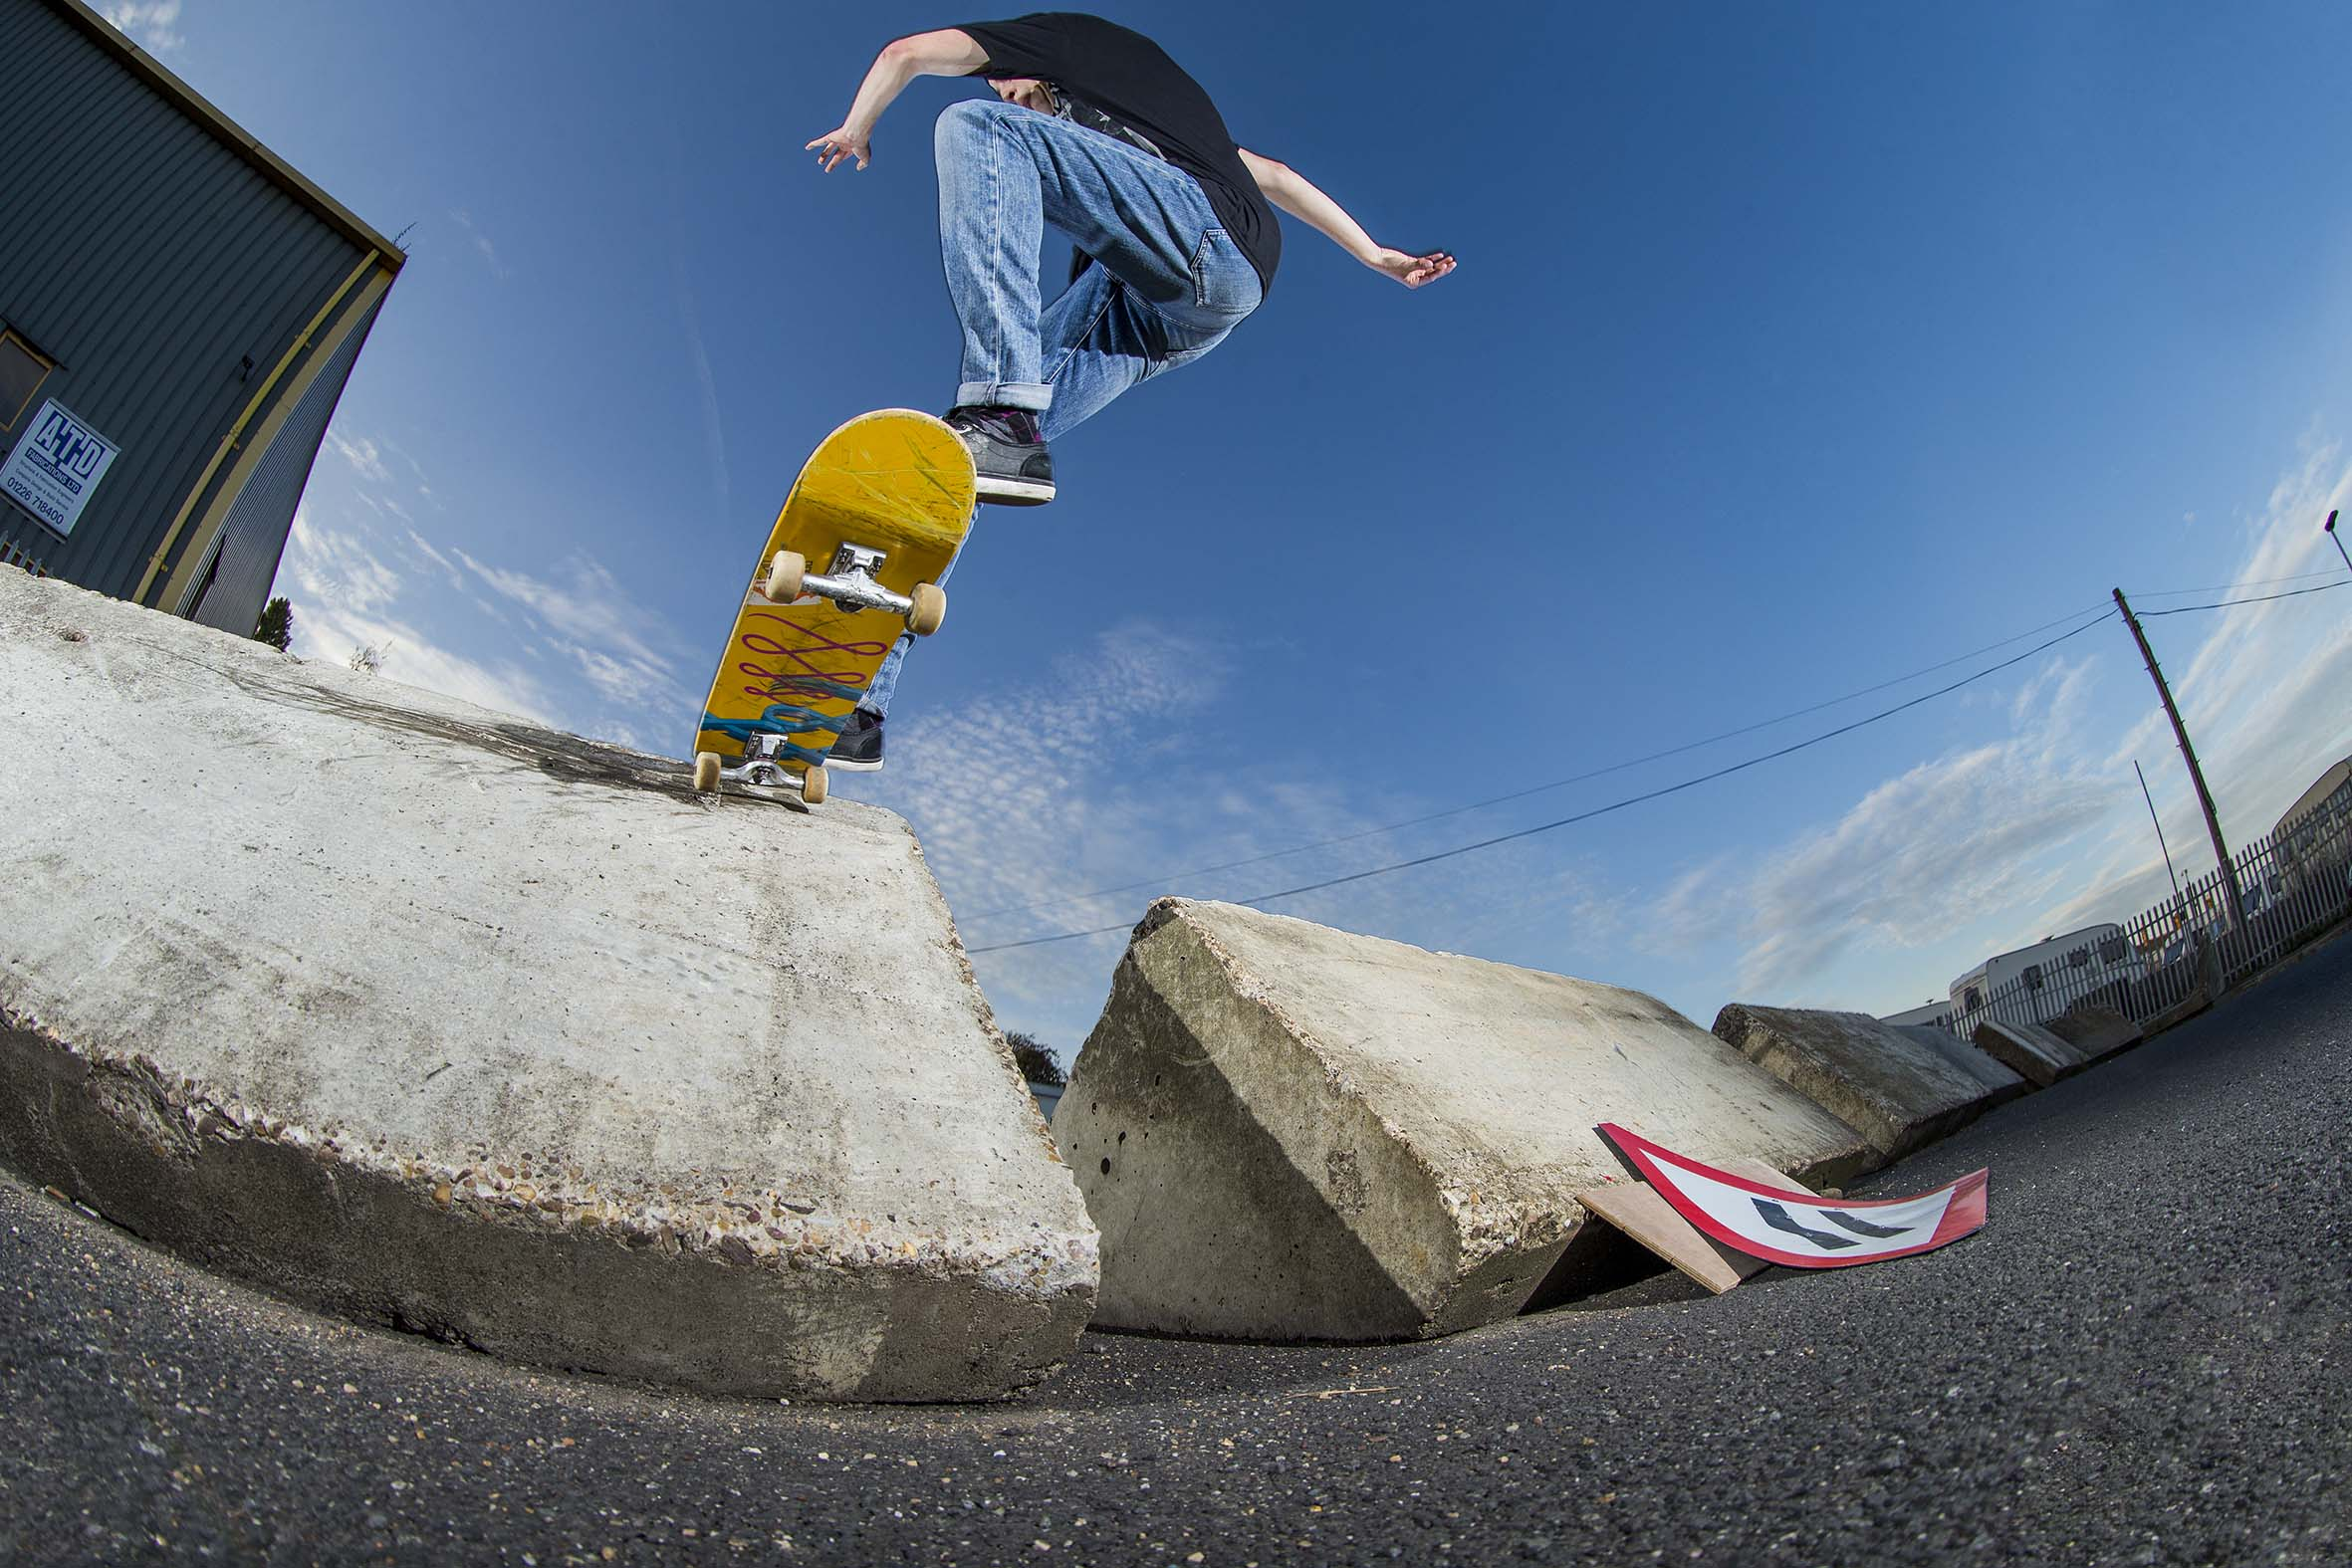 Myles Rushforth - gap frontside tailslide